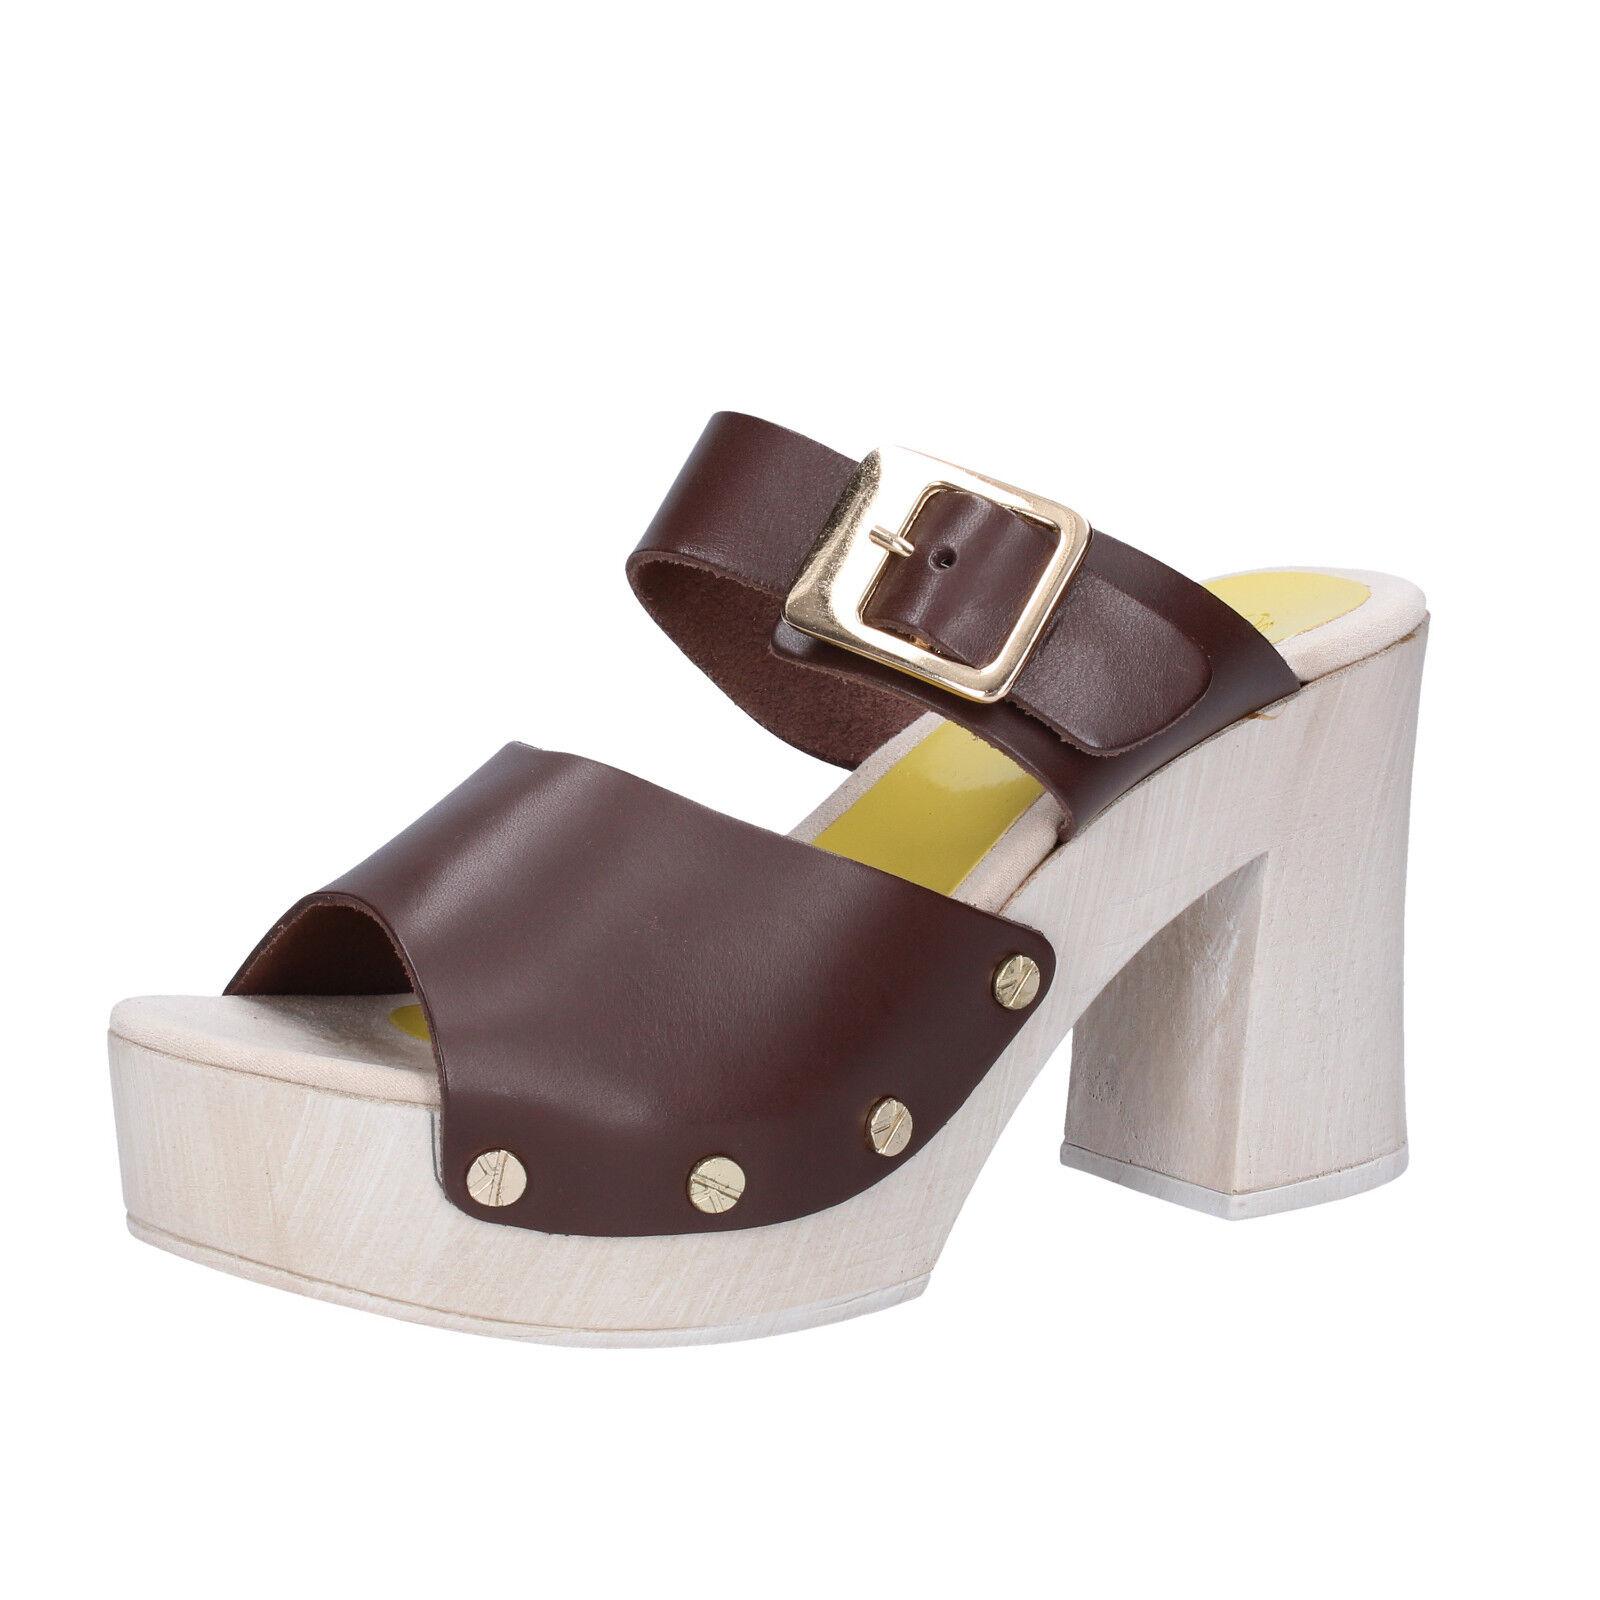 Scarpe donna SUKY SUKY pelle BRAND 38 EU sandali marrone pelle SUKY SUKY AB293 ... 596f70